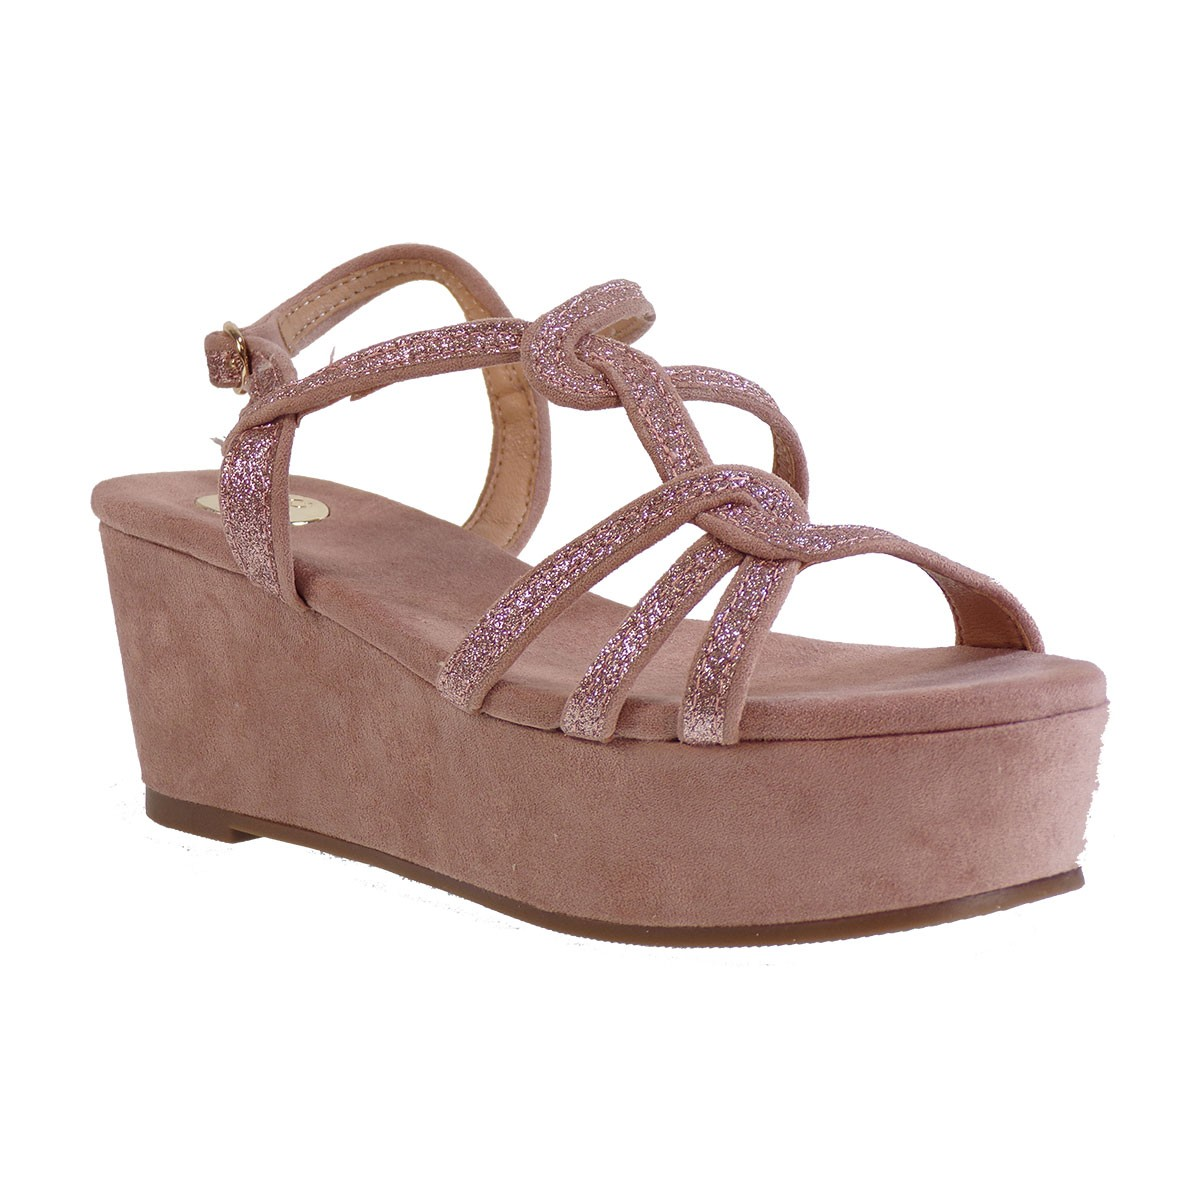 EXE Shoes Γυναικεία Πέδιλα Πλατφόρμες 343-CORFU-334 Νude Ι4700343771005